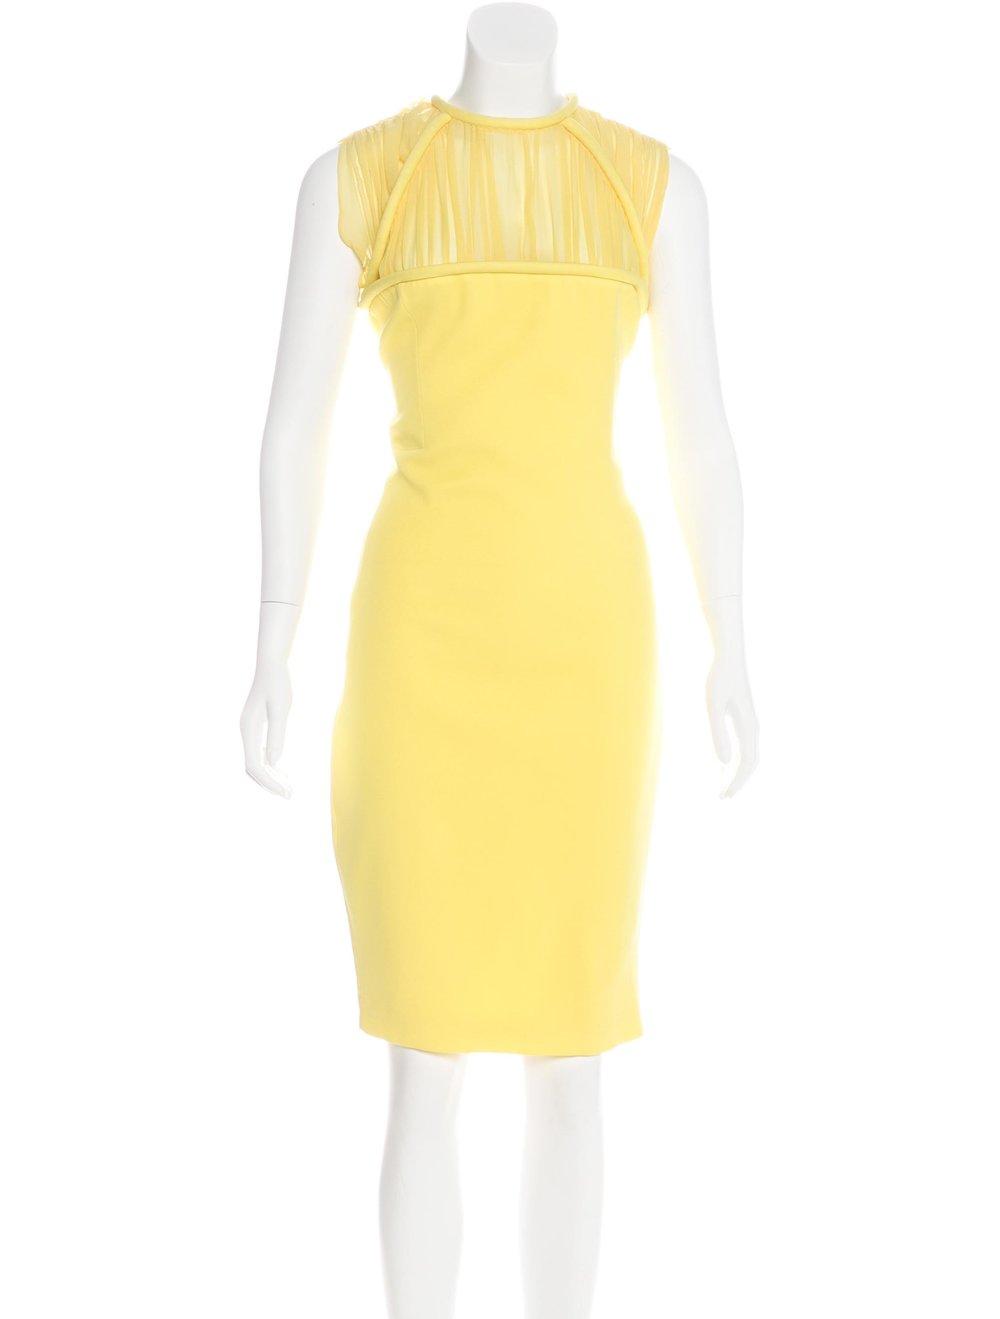 HAKAAN SLEEVELESS KNEE-LENGTH DRESS; Size: US 12; $125.00